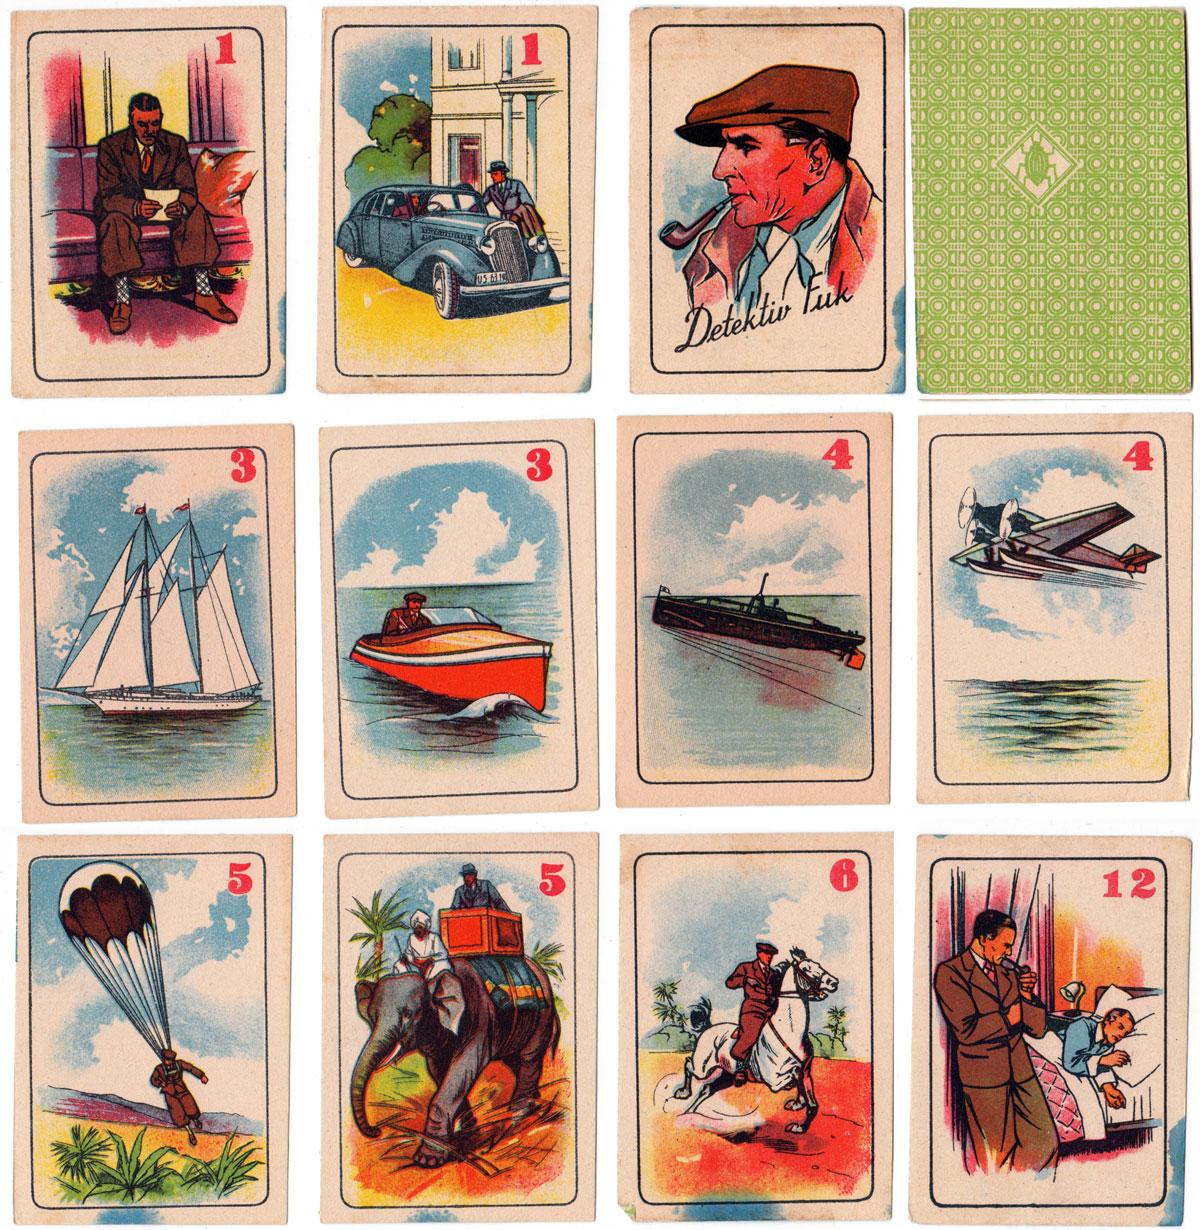 'Detektiv Fuk' card game from Czechoslovakia